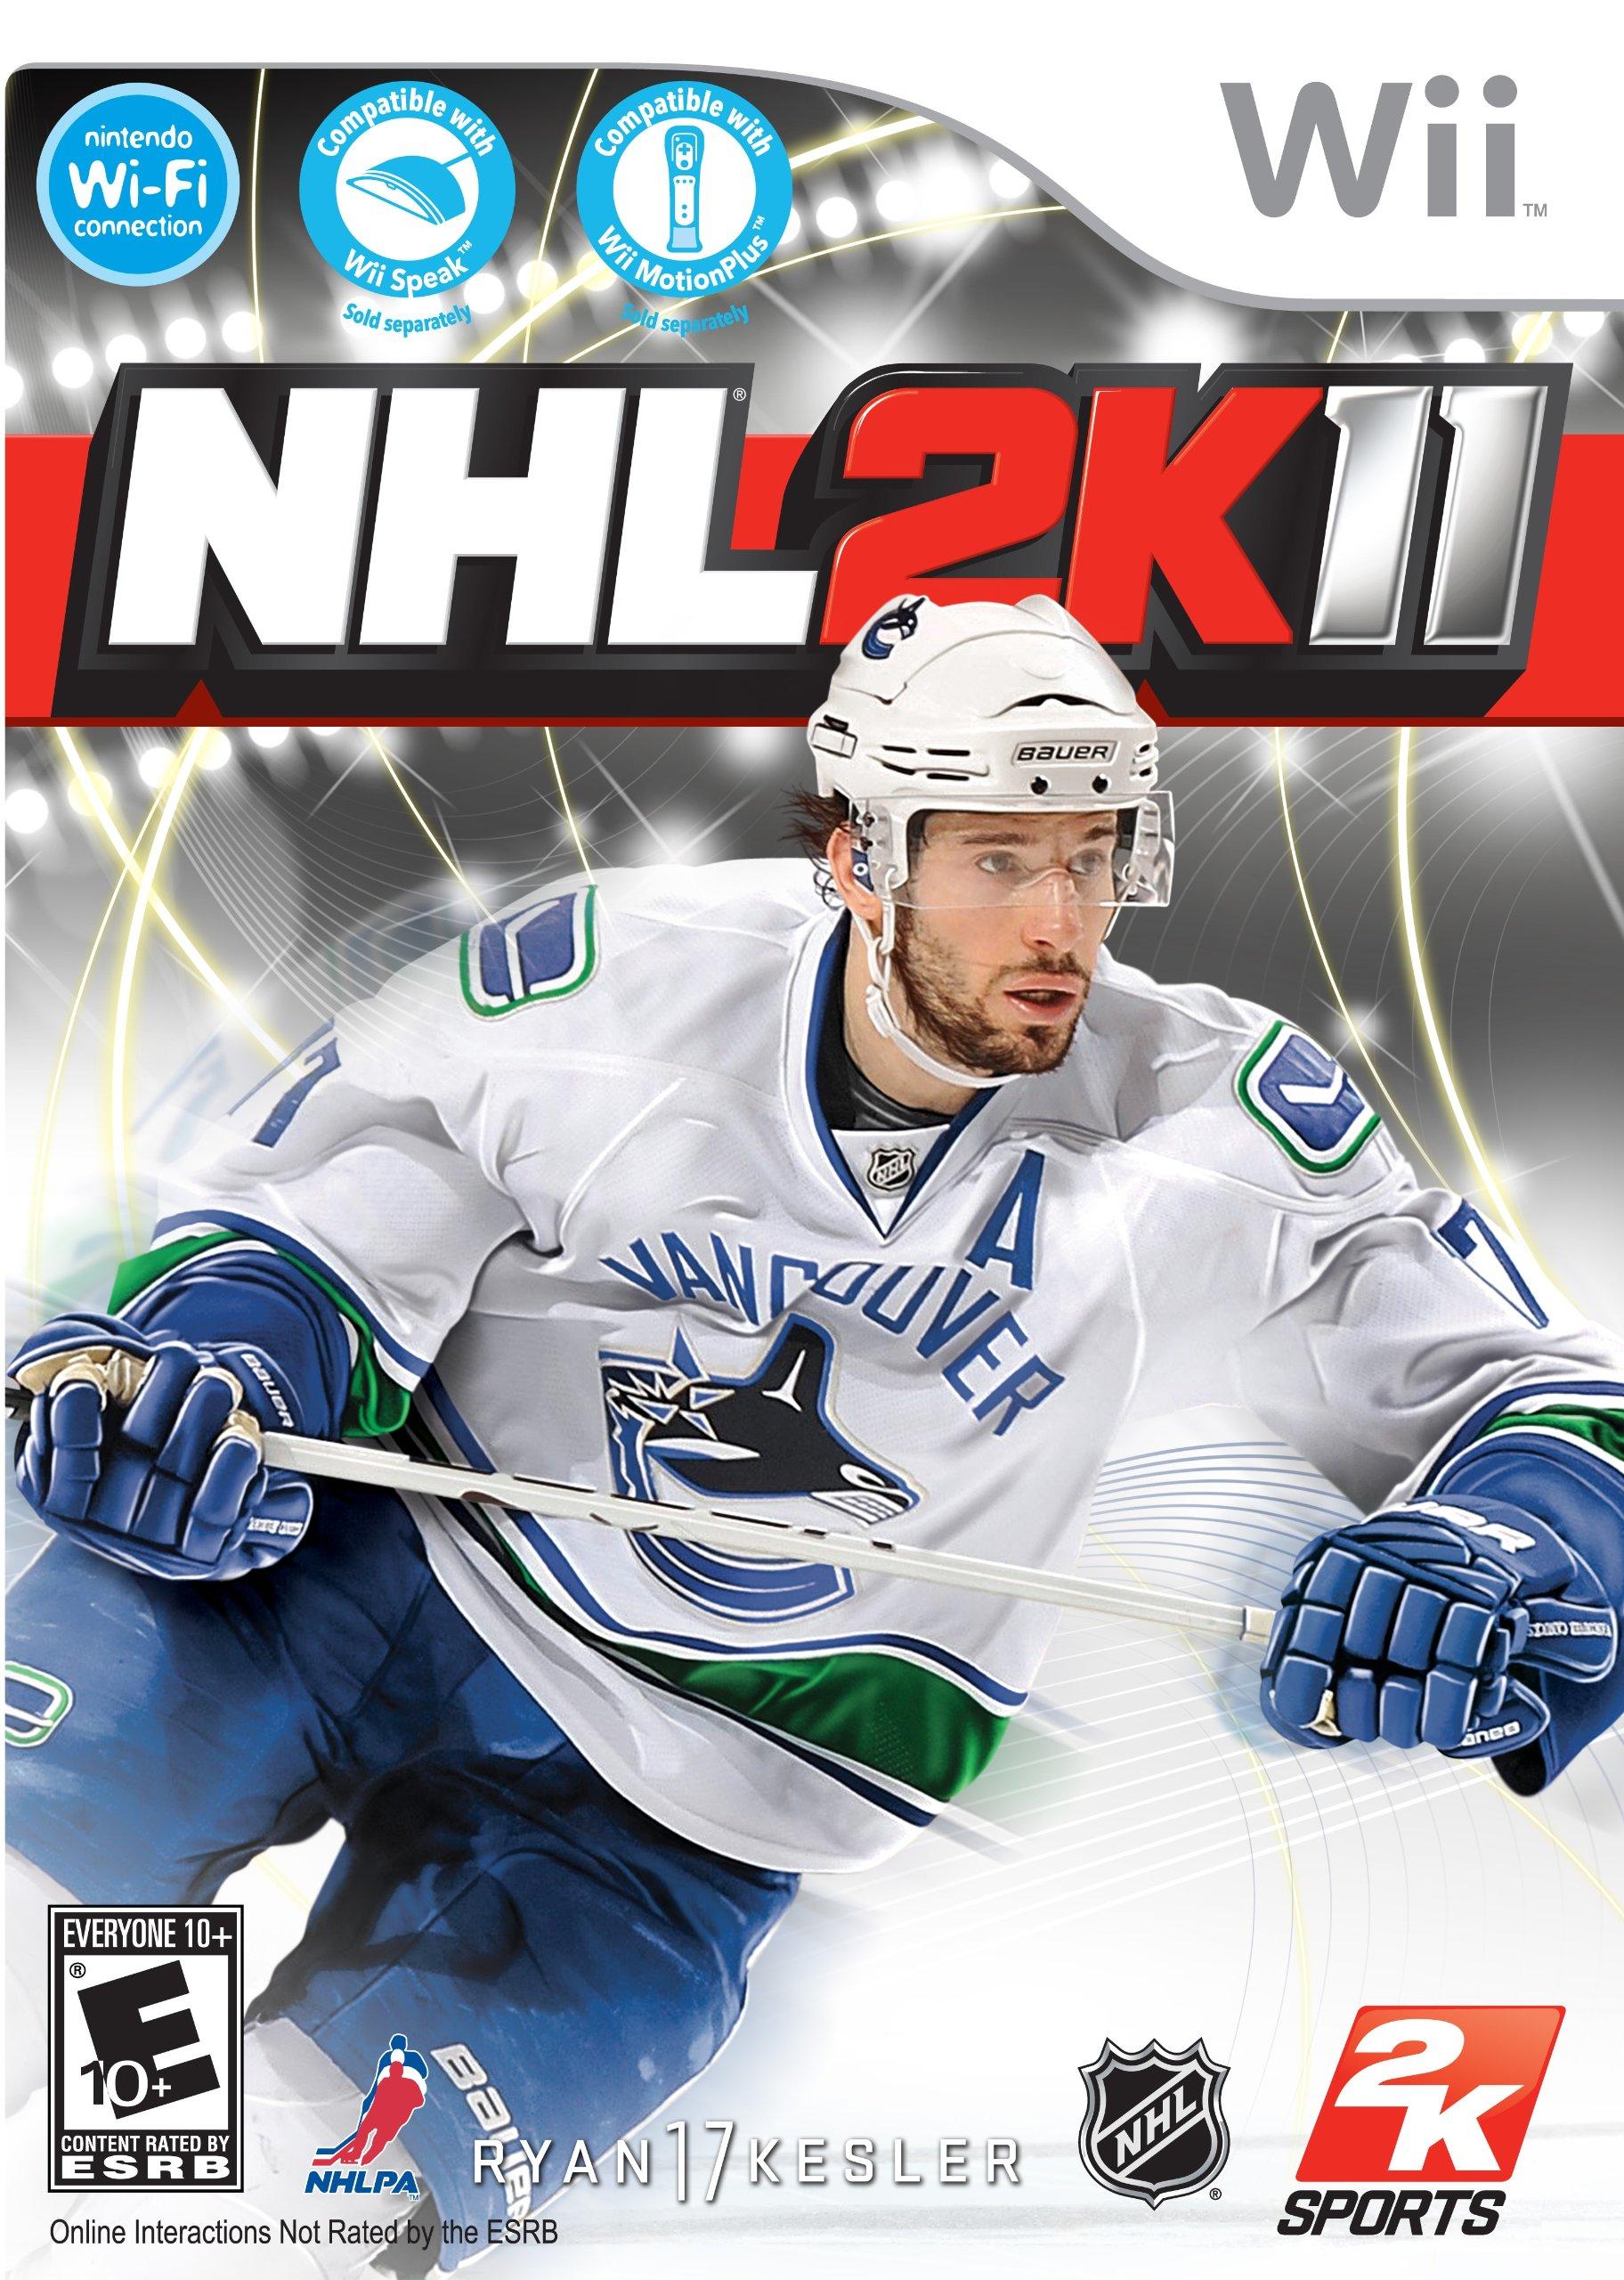 NHL 2K11/Wii